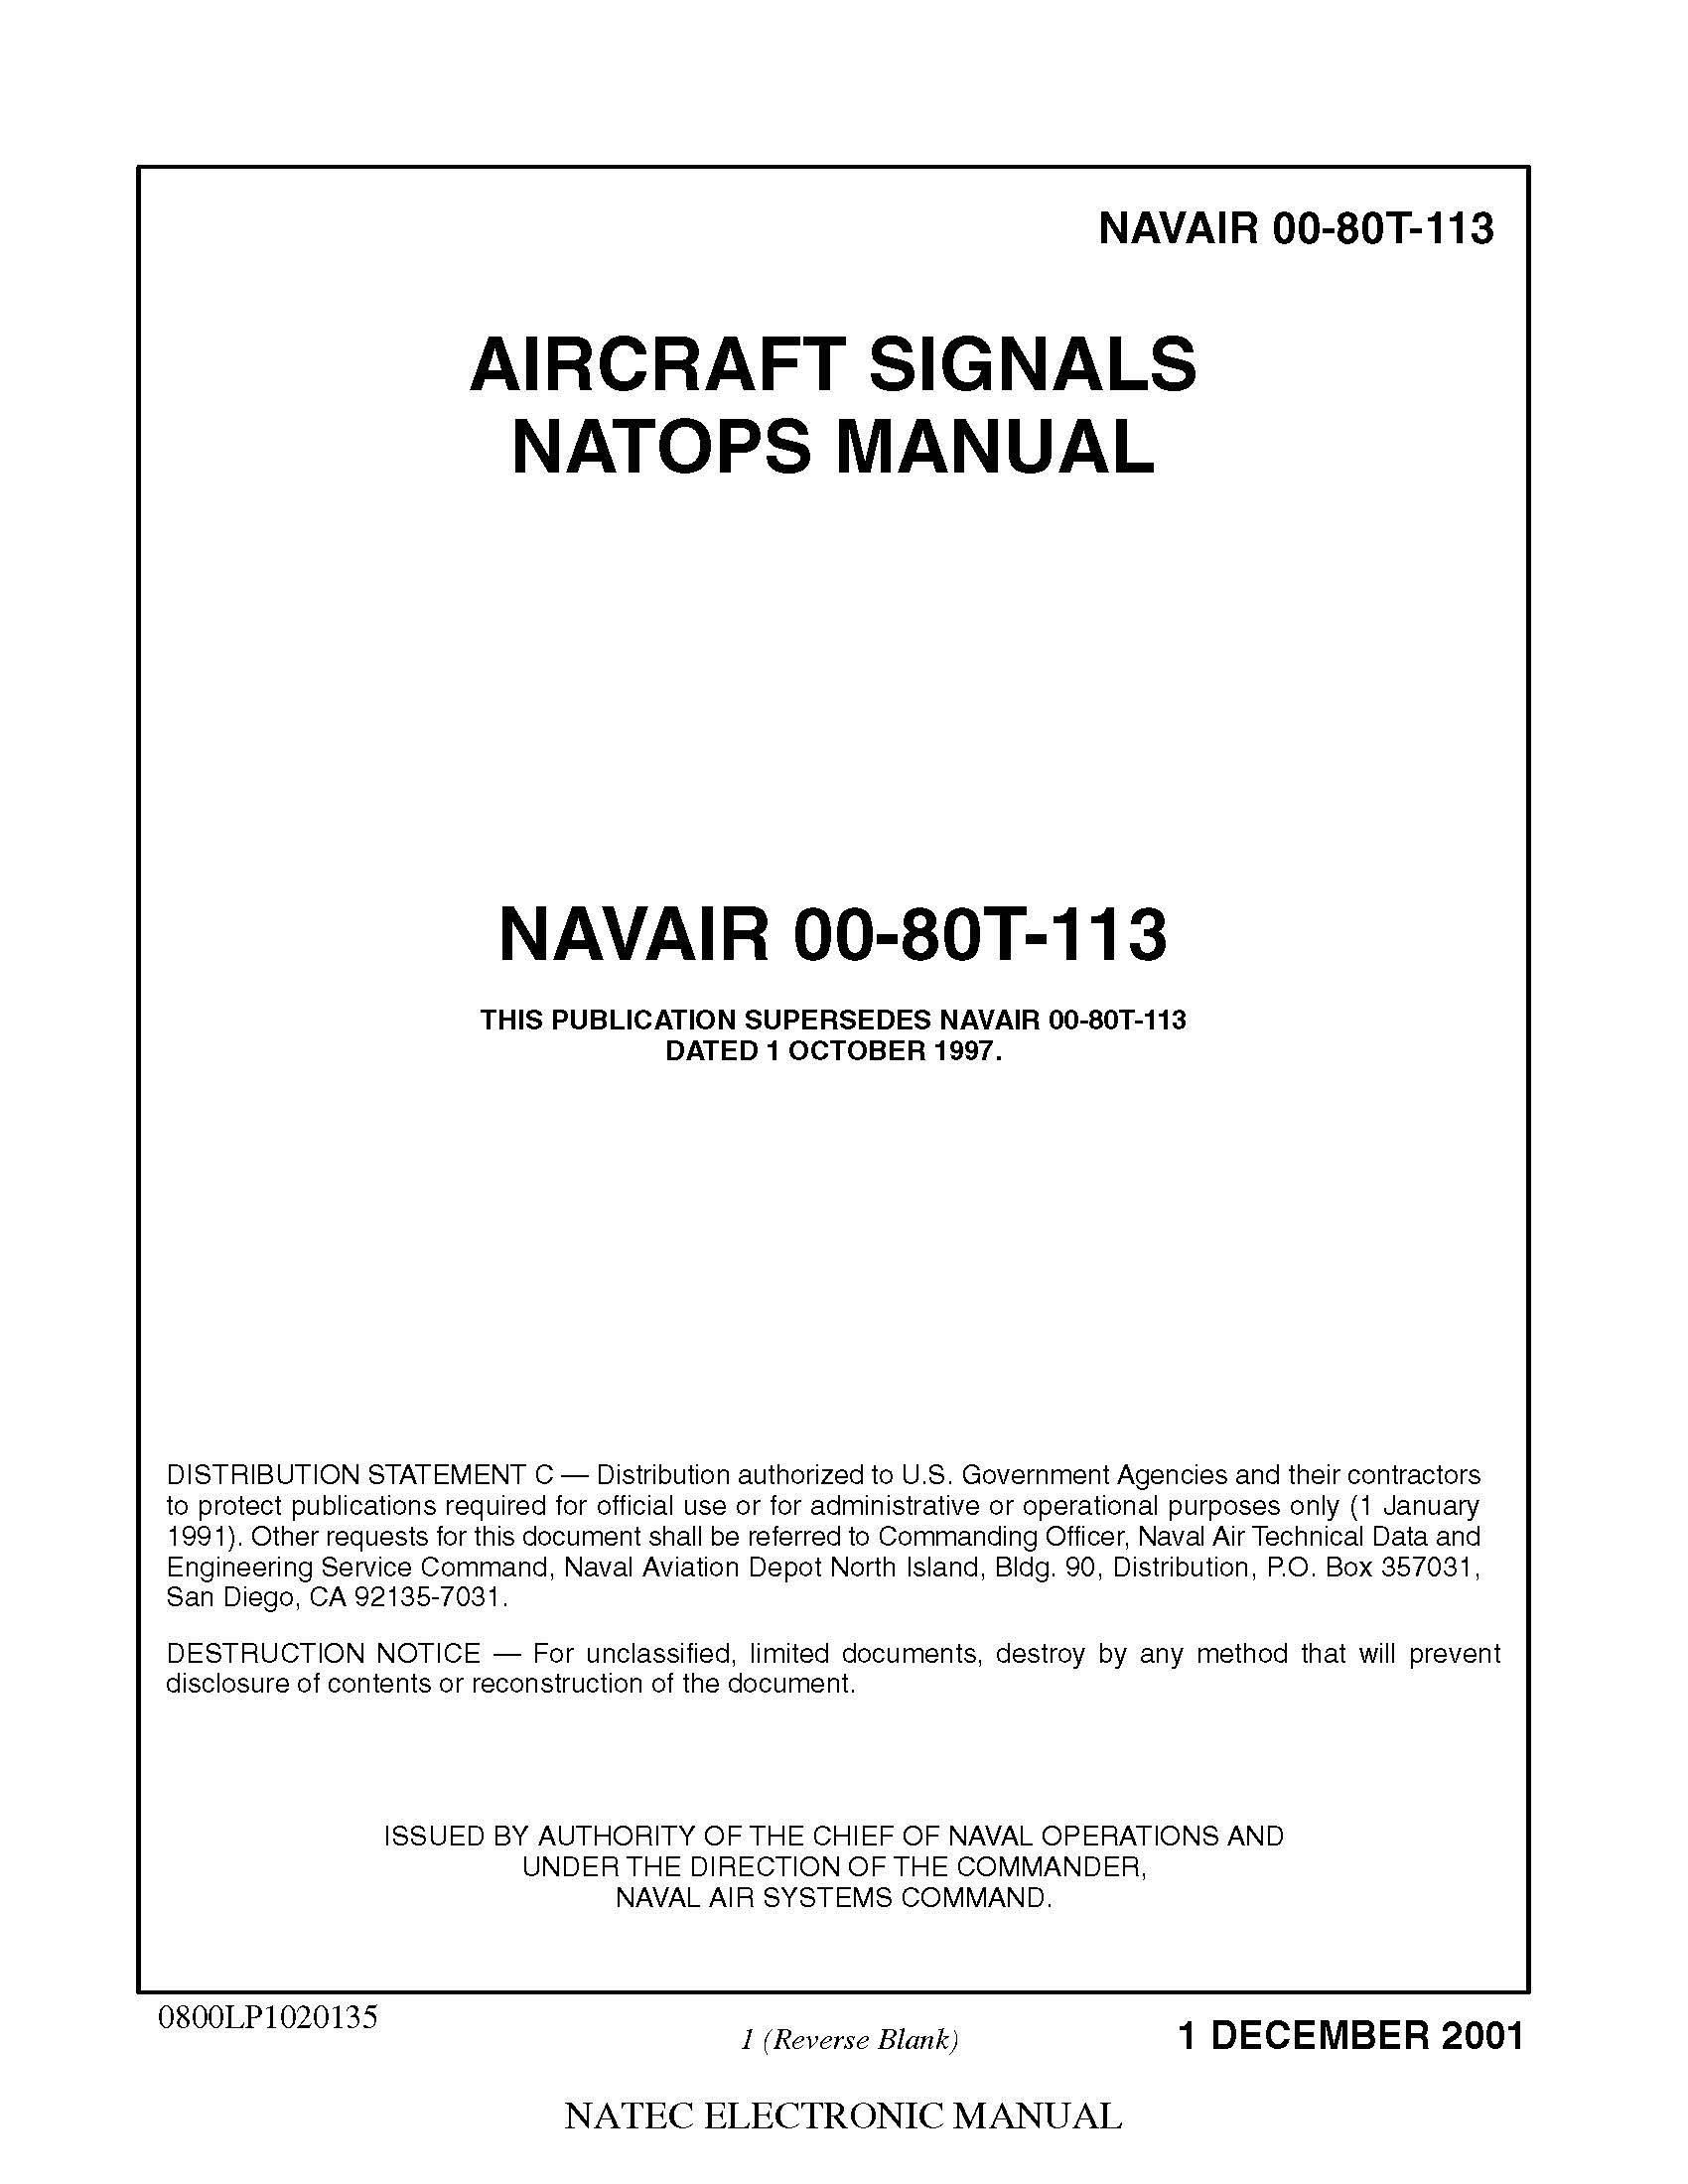 NAVAIR 00 80T 113 Aircraft Signals NATOPS Manual Loose Leaf Edition 2001